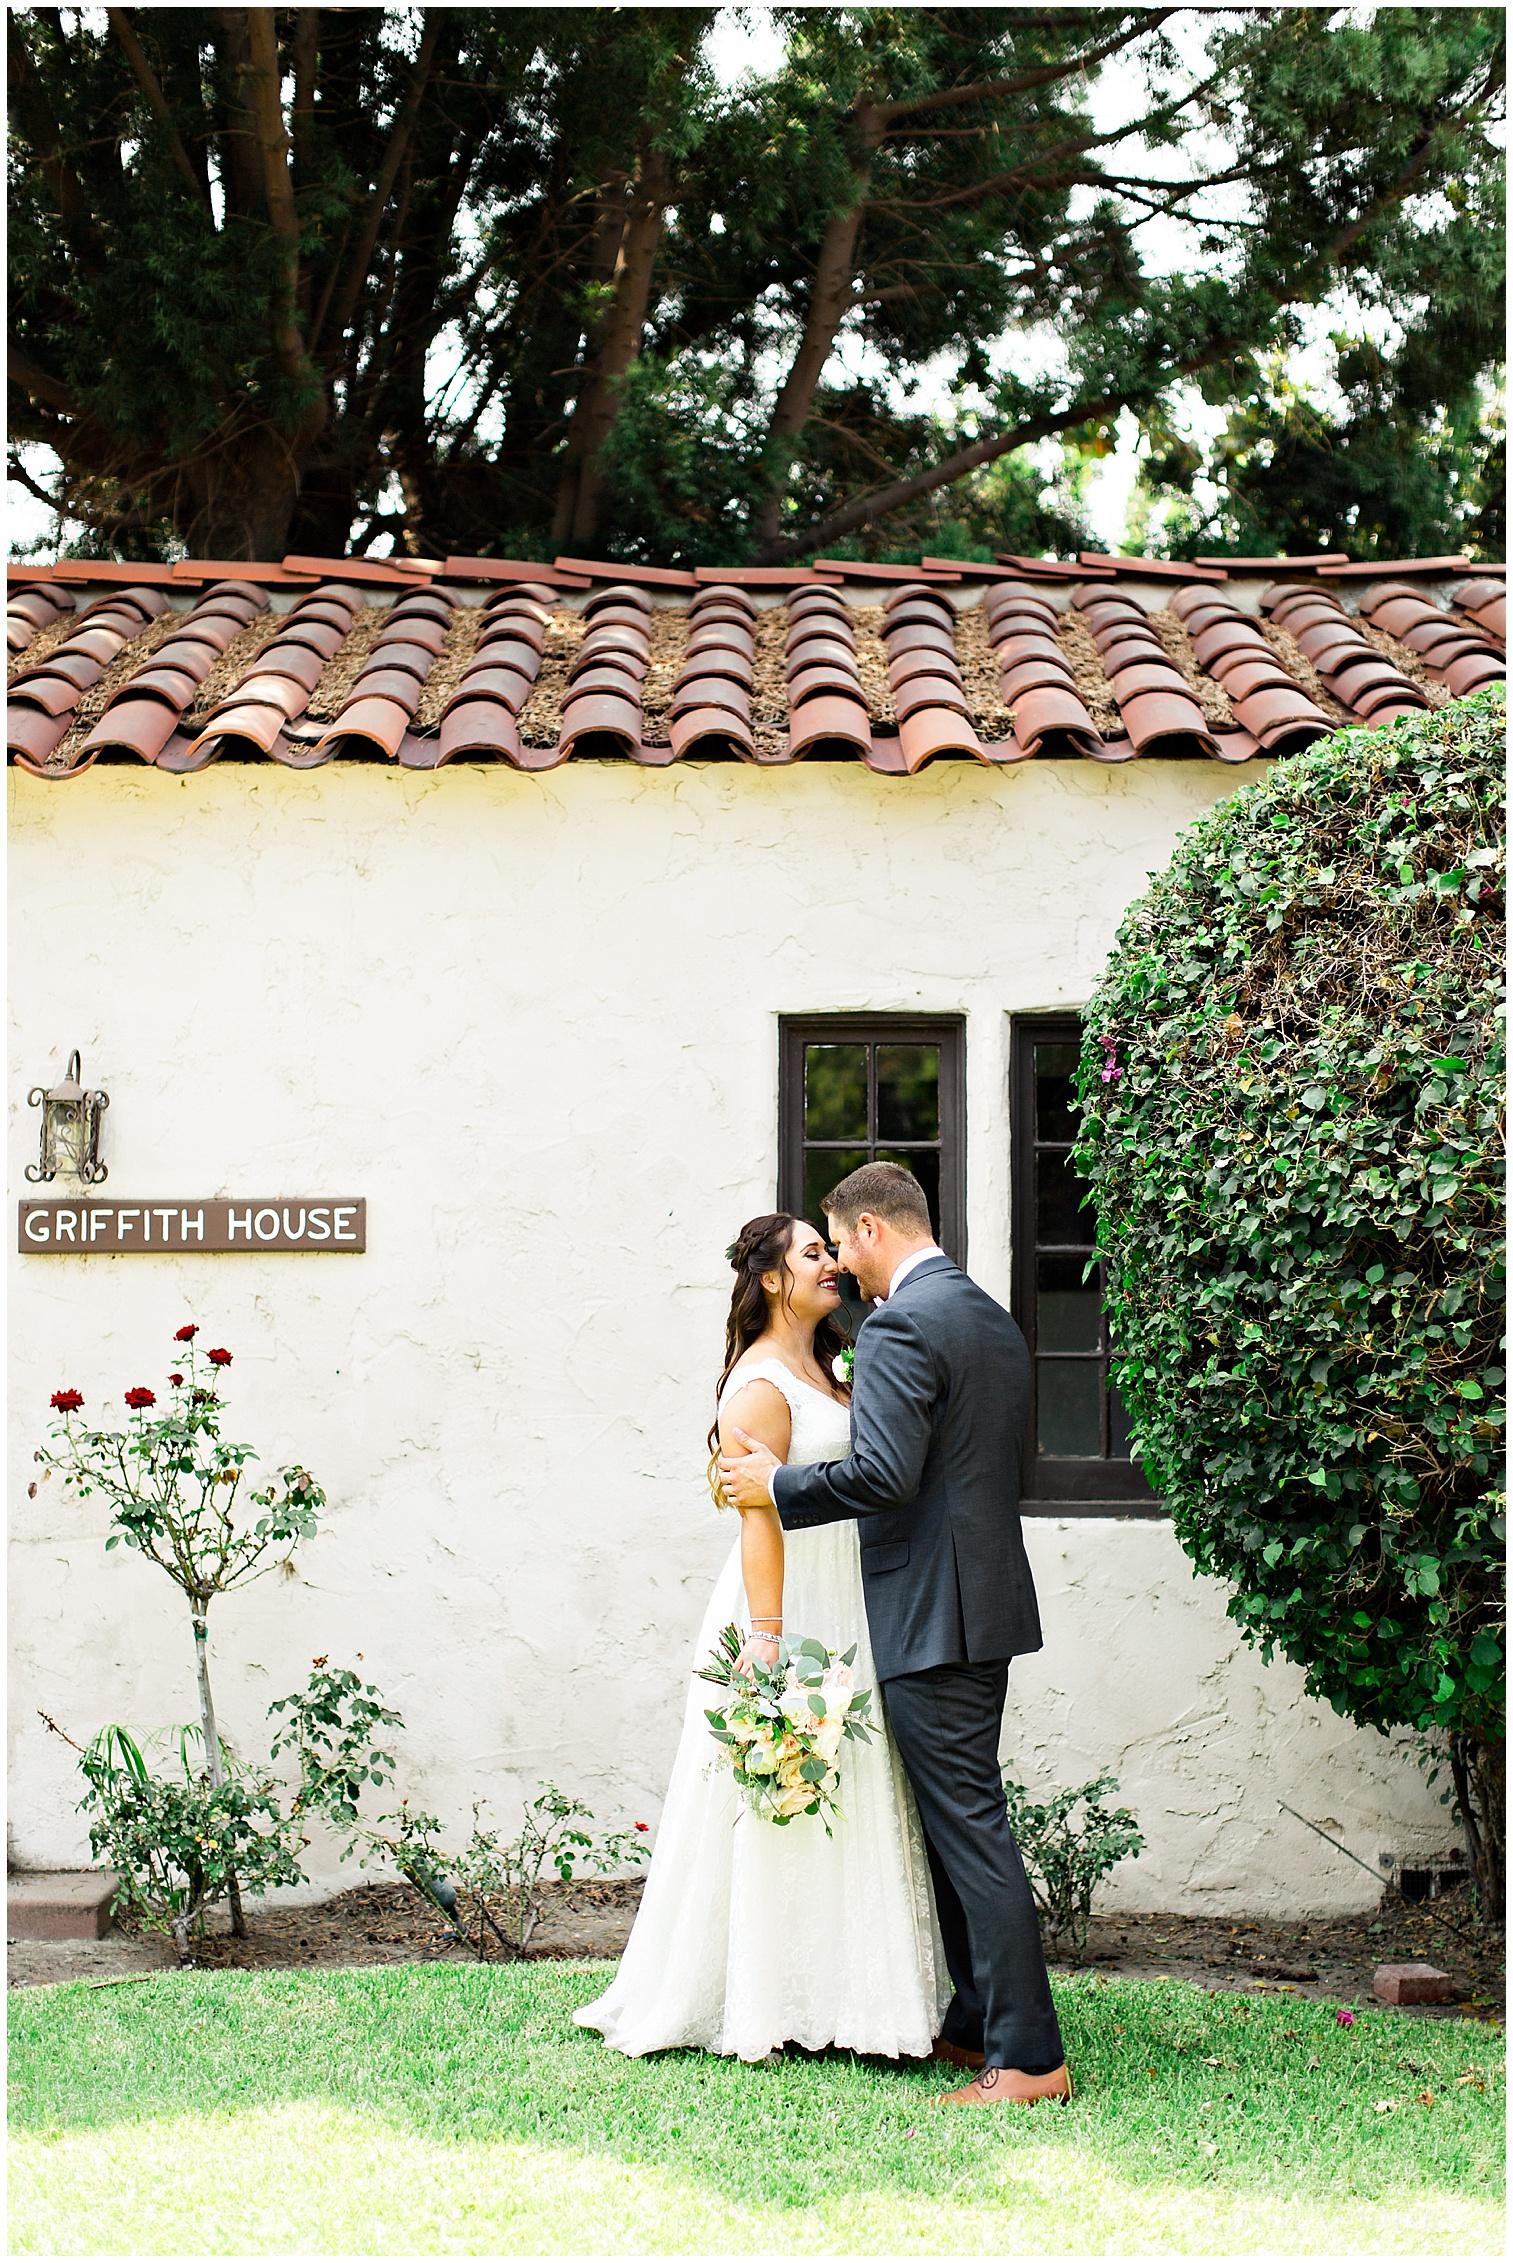 Griffith_House_Wedding_Photography_0552.jpg